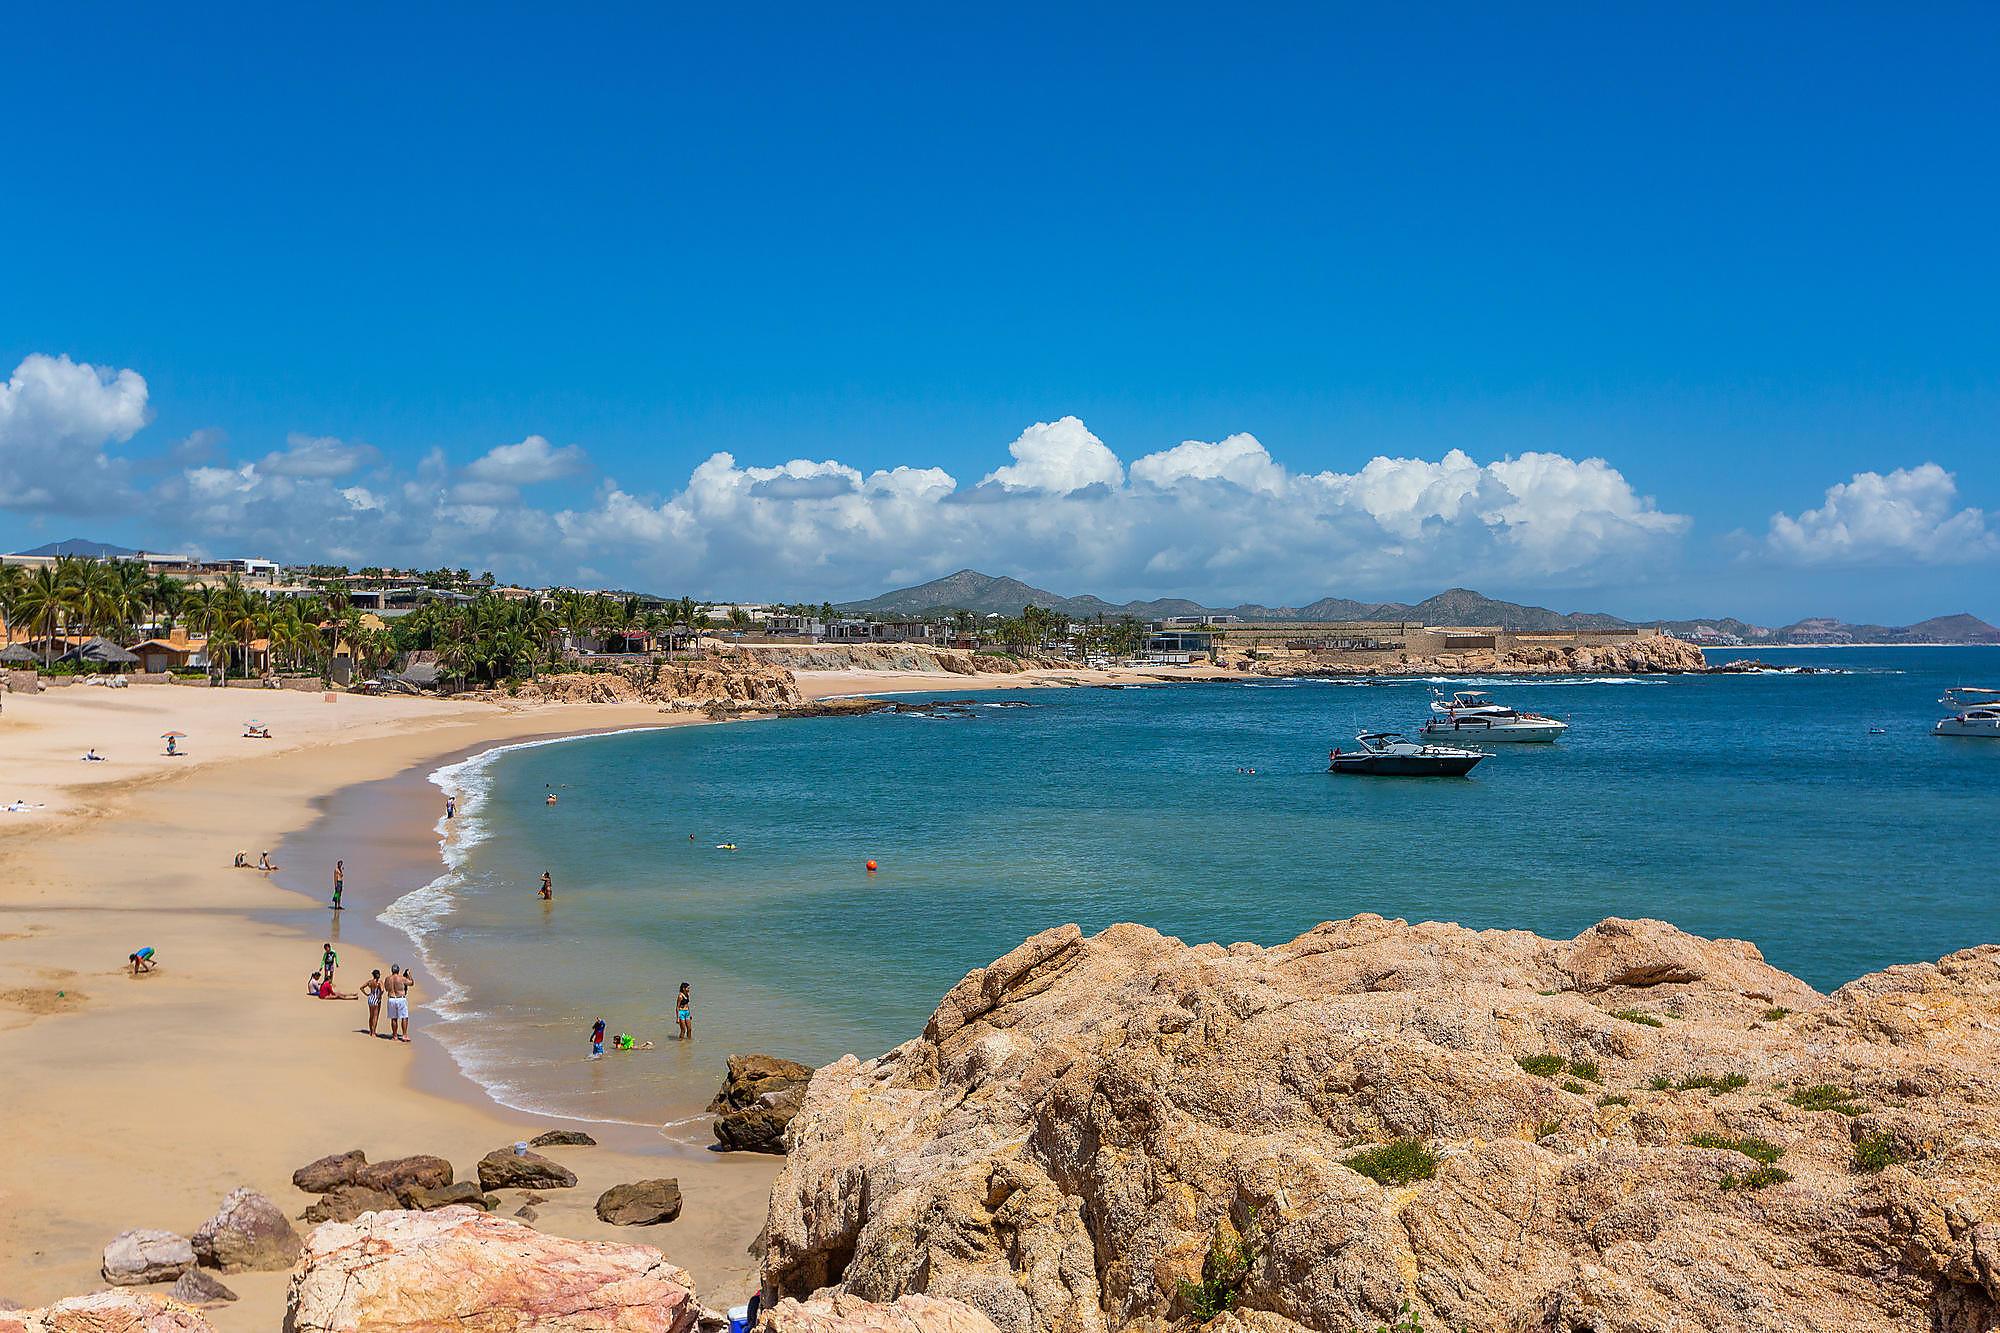 Chileno Bay Beach from Chileno Bay Resort & Residences